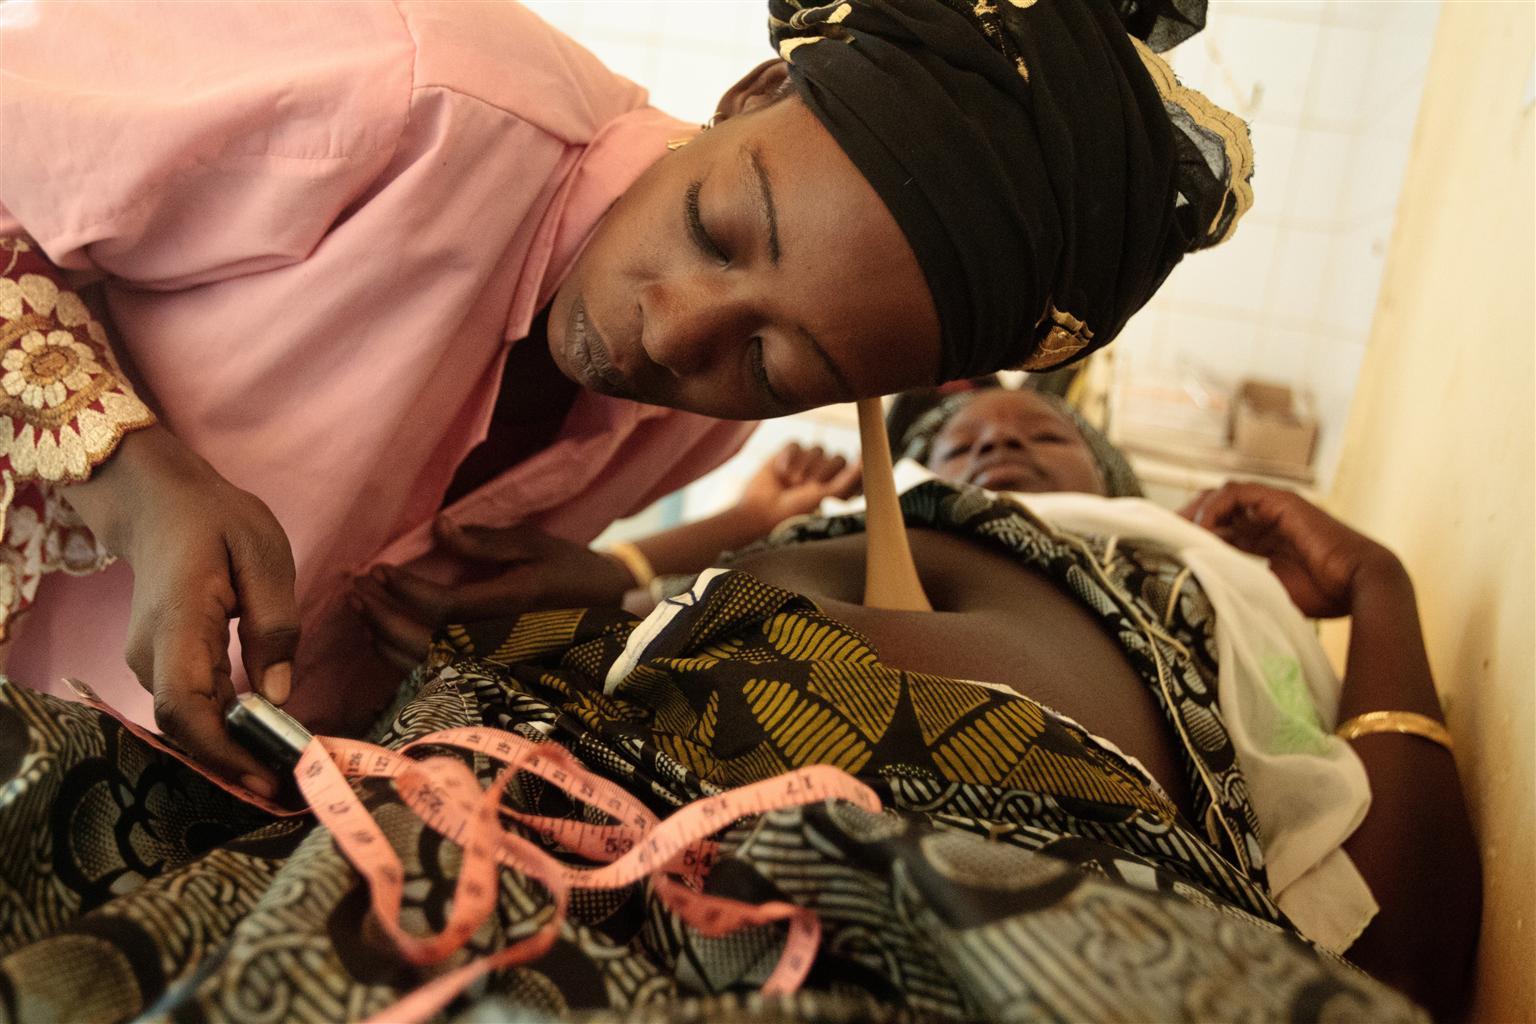 © UNICEF/NYHQ2012-0329/OLIVIER ASSELIN